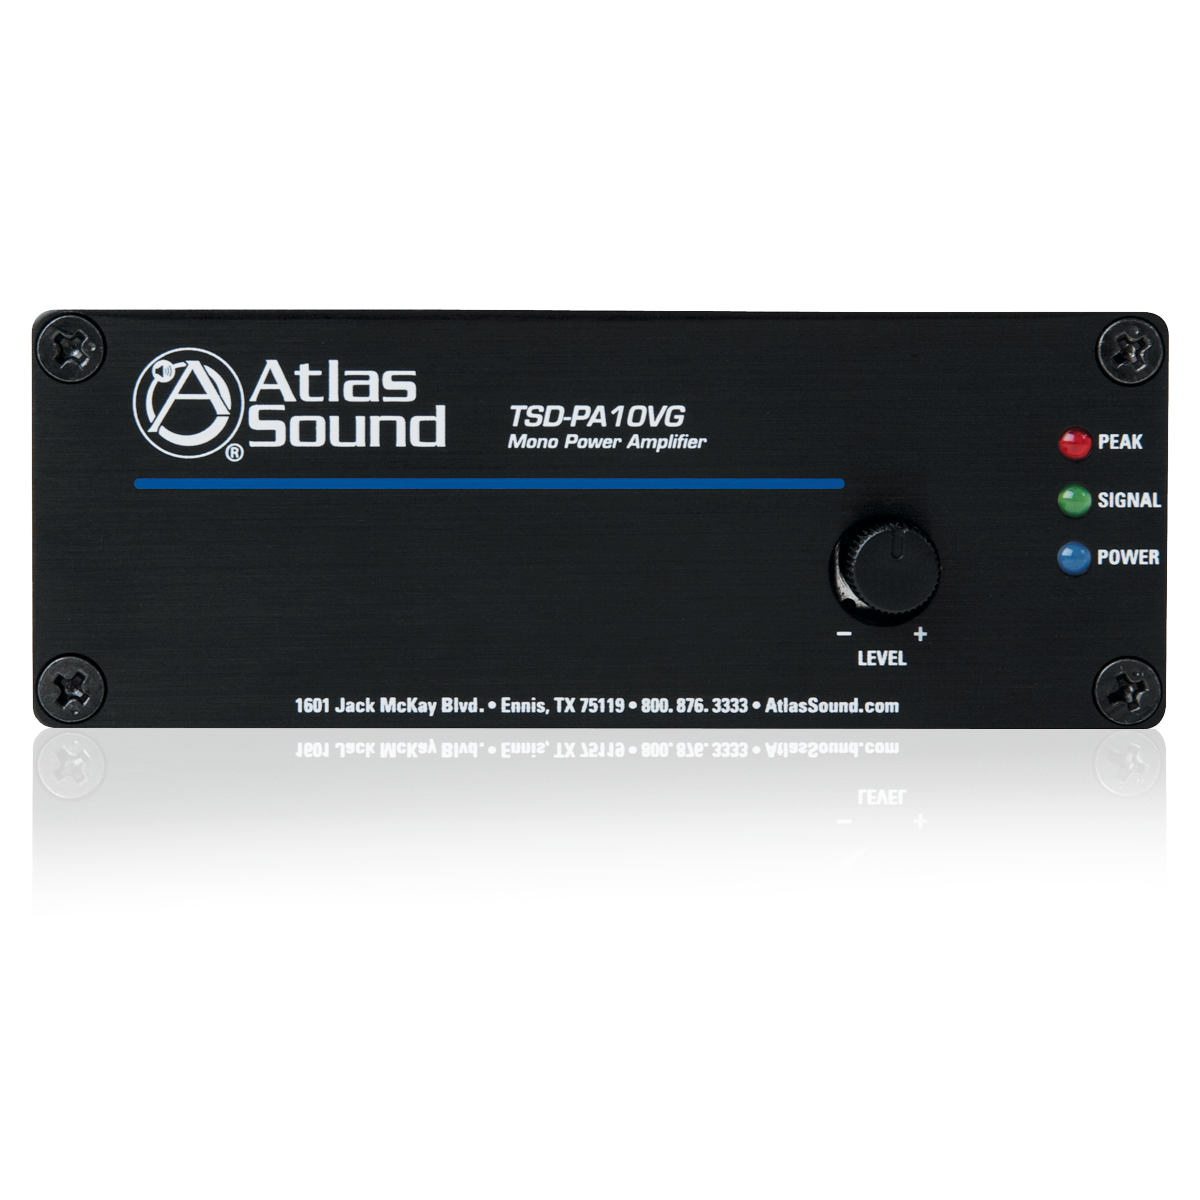 1 input 10 watt 25v 70v 100v 4Ω power amplifier atlasied